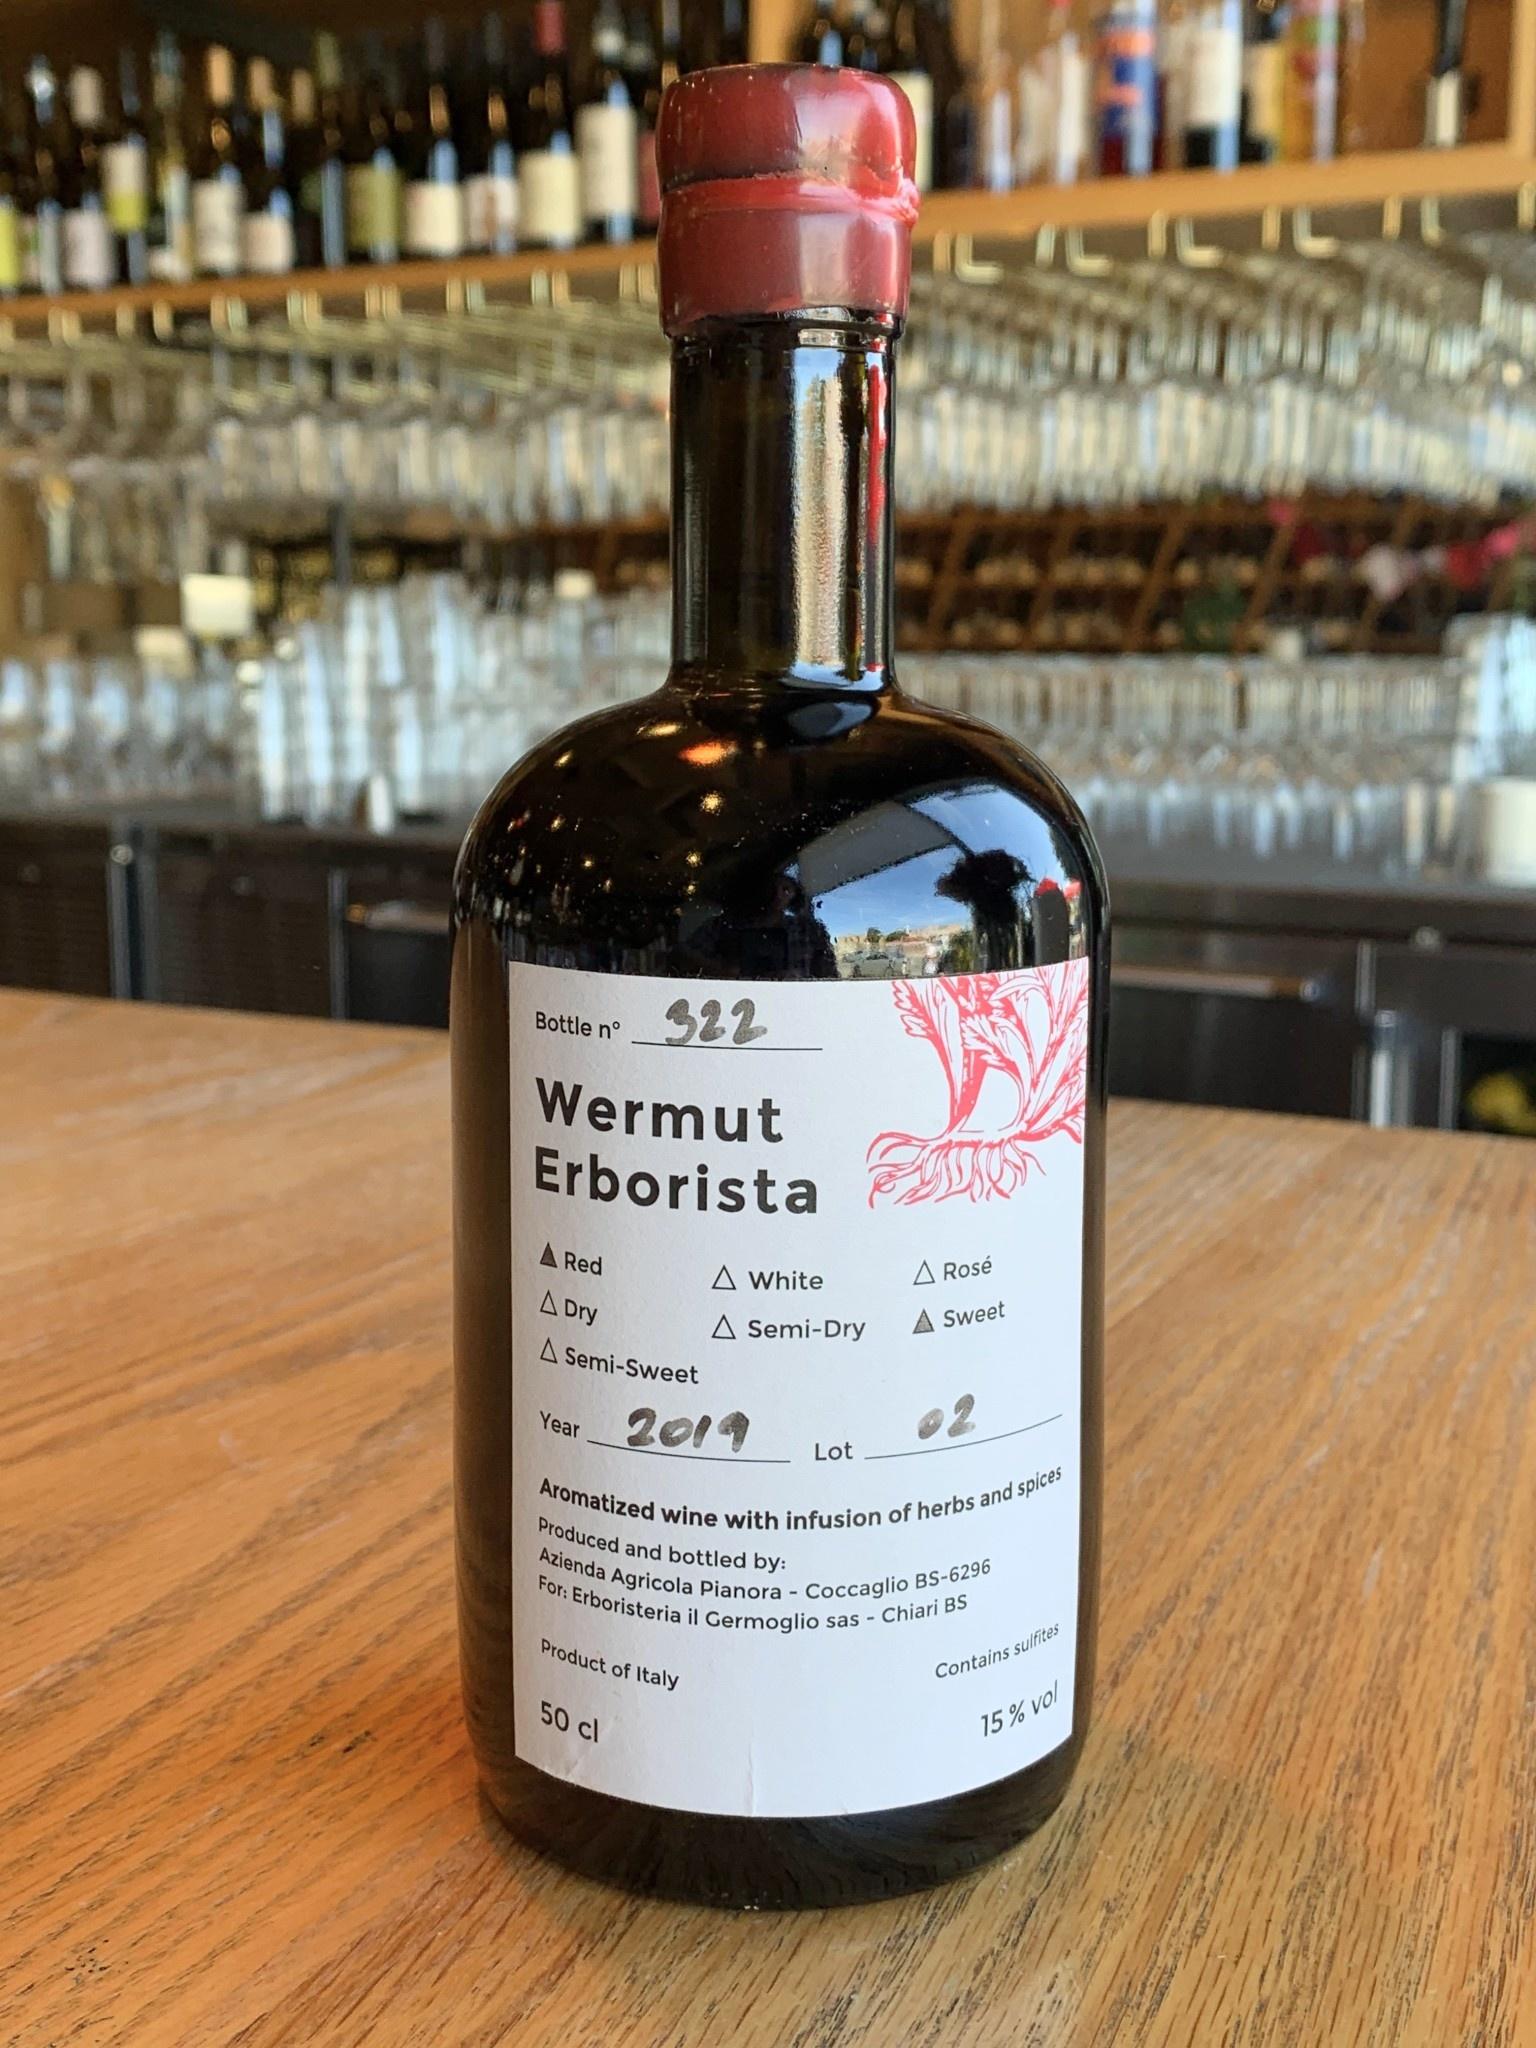 Pianora Pianora Pianora Pianora Wermut Erborista Vermouth 500ml